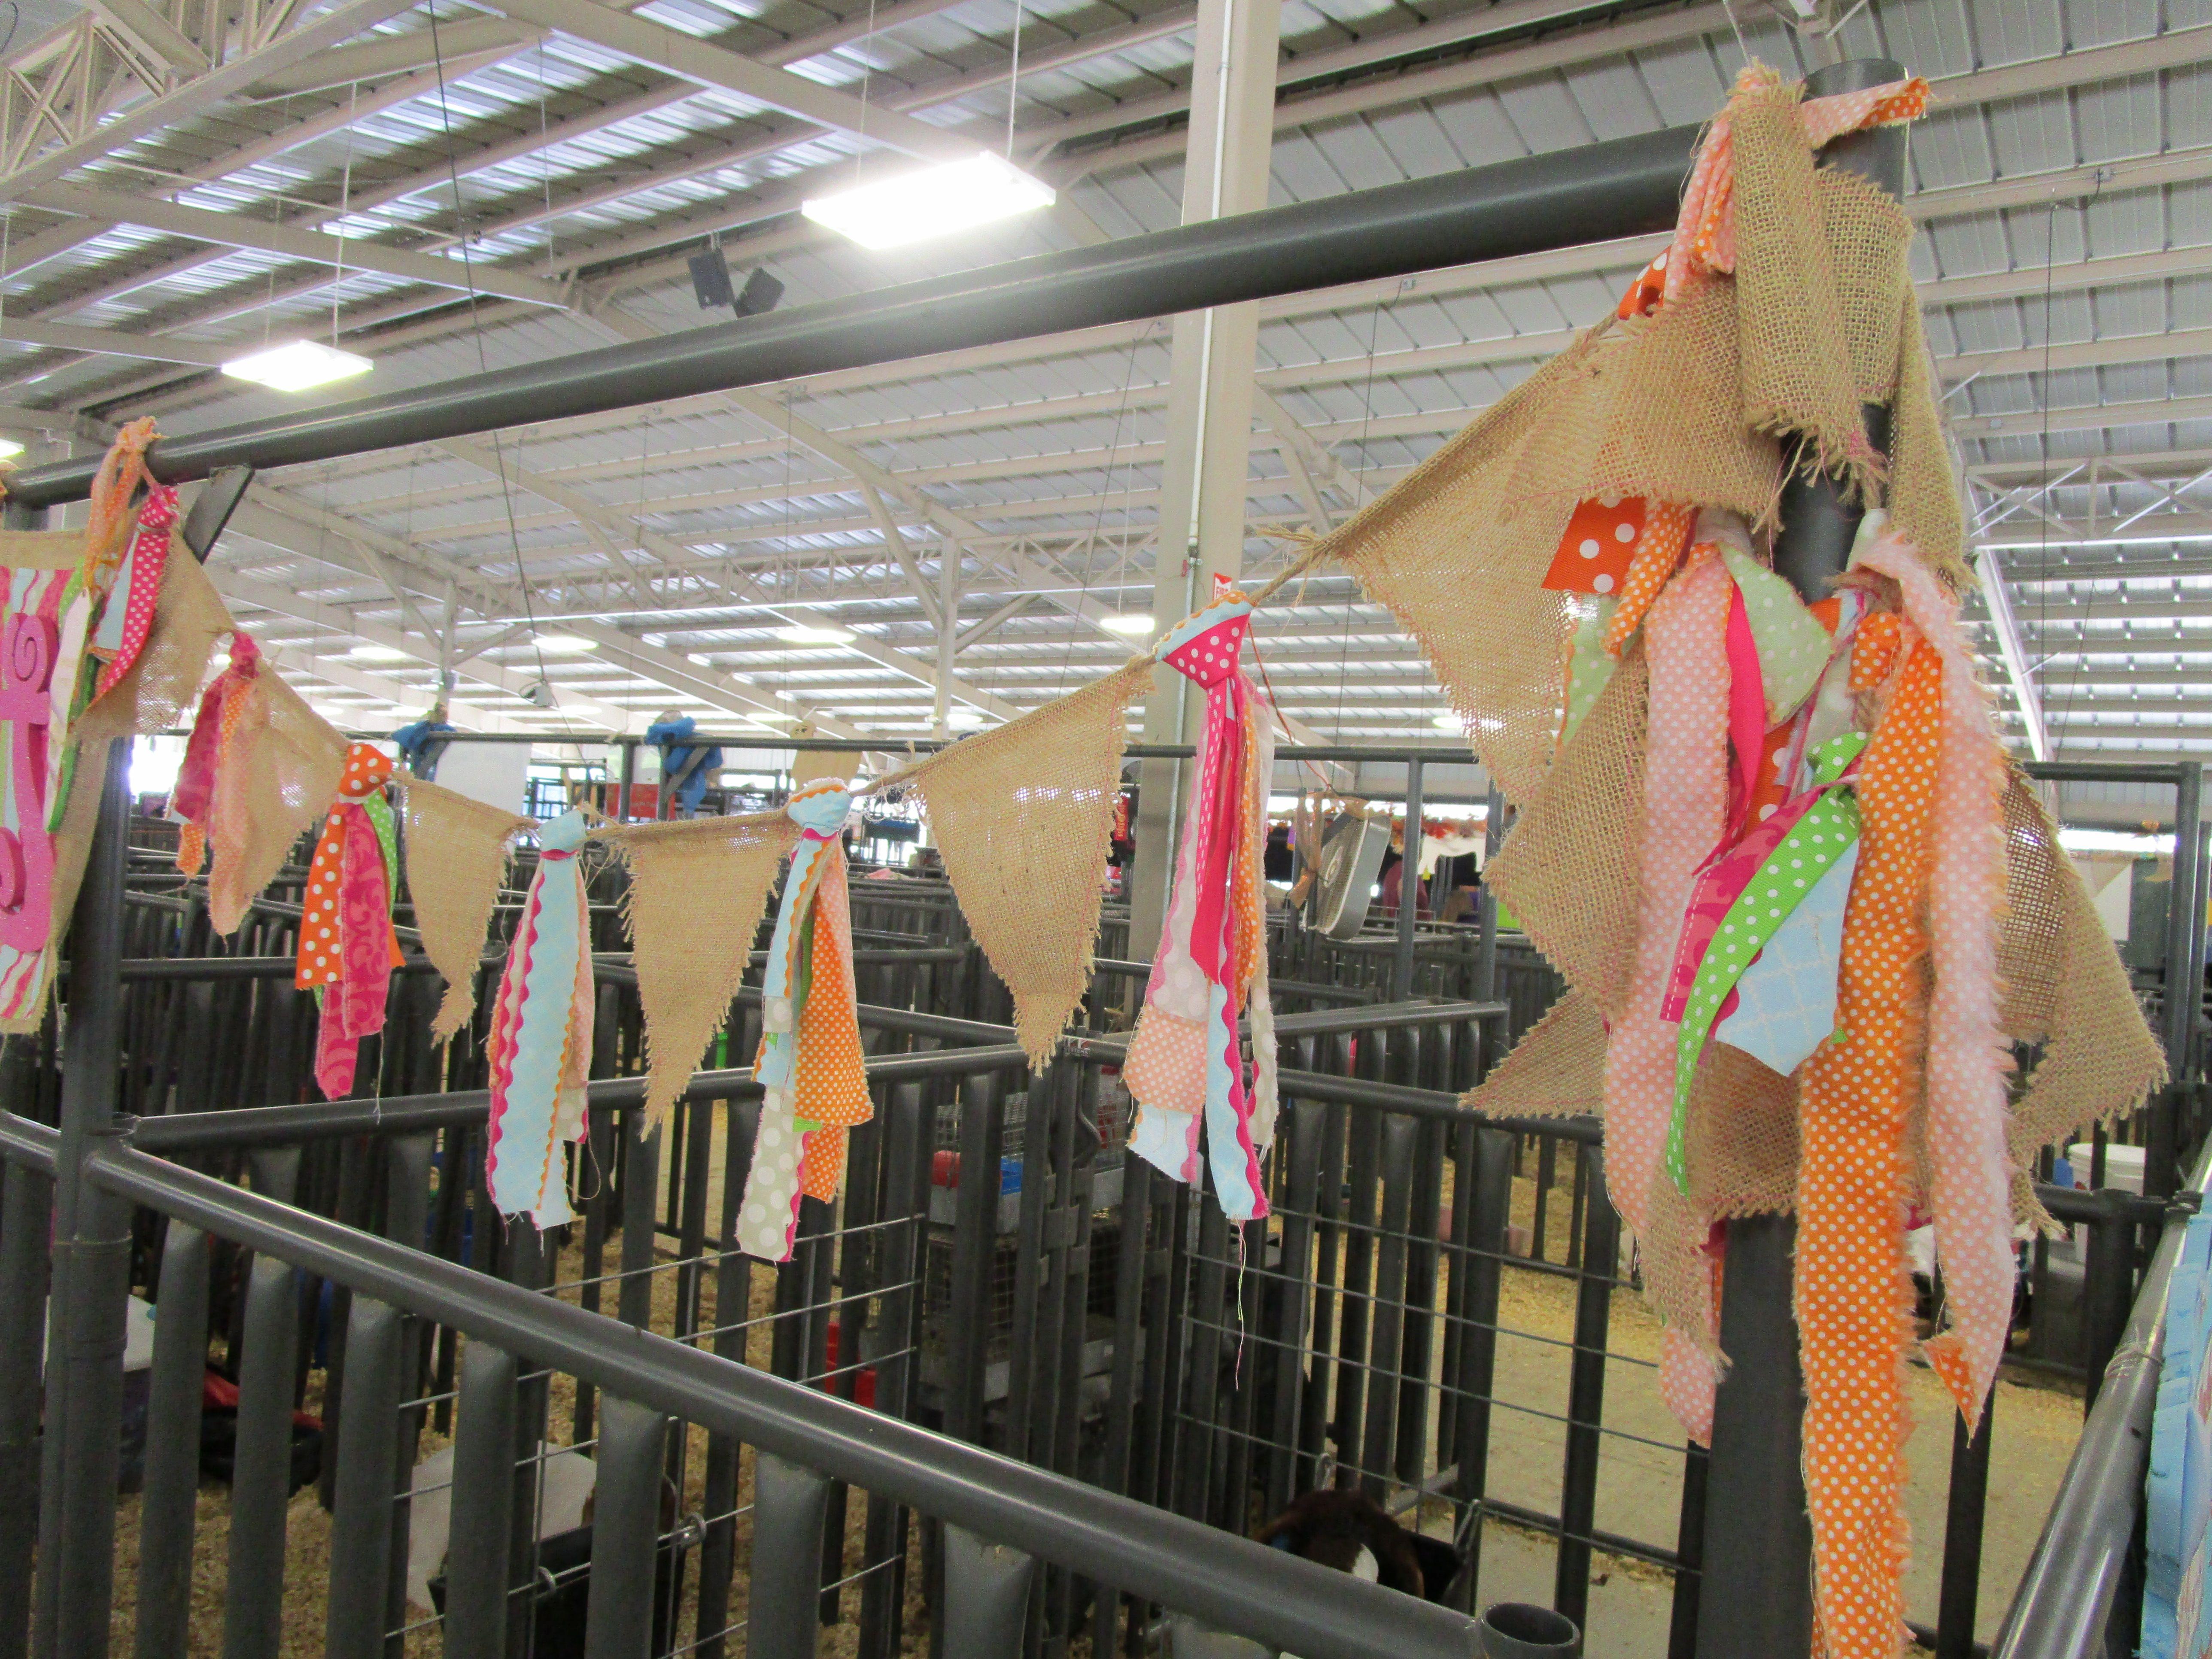 4h Fair Pen Decoration Ideas Google Search Horse Stall